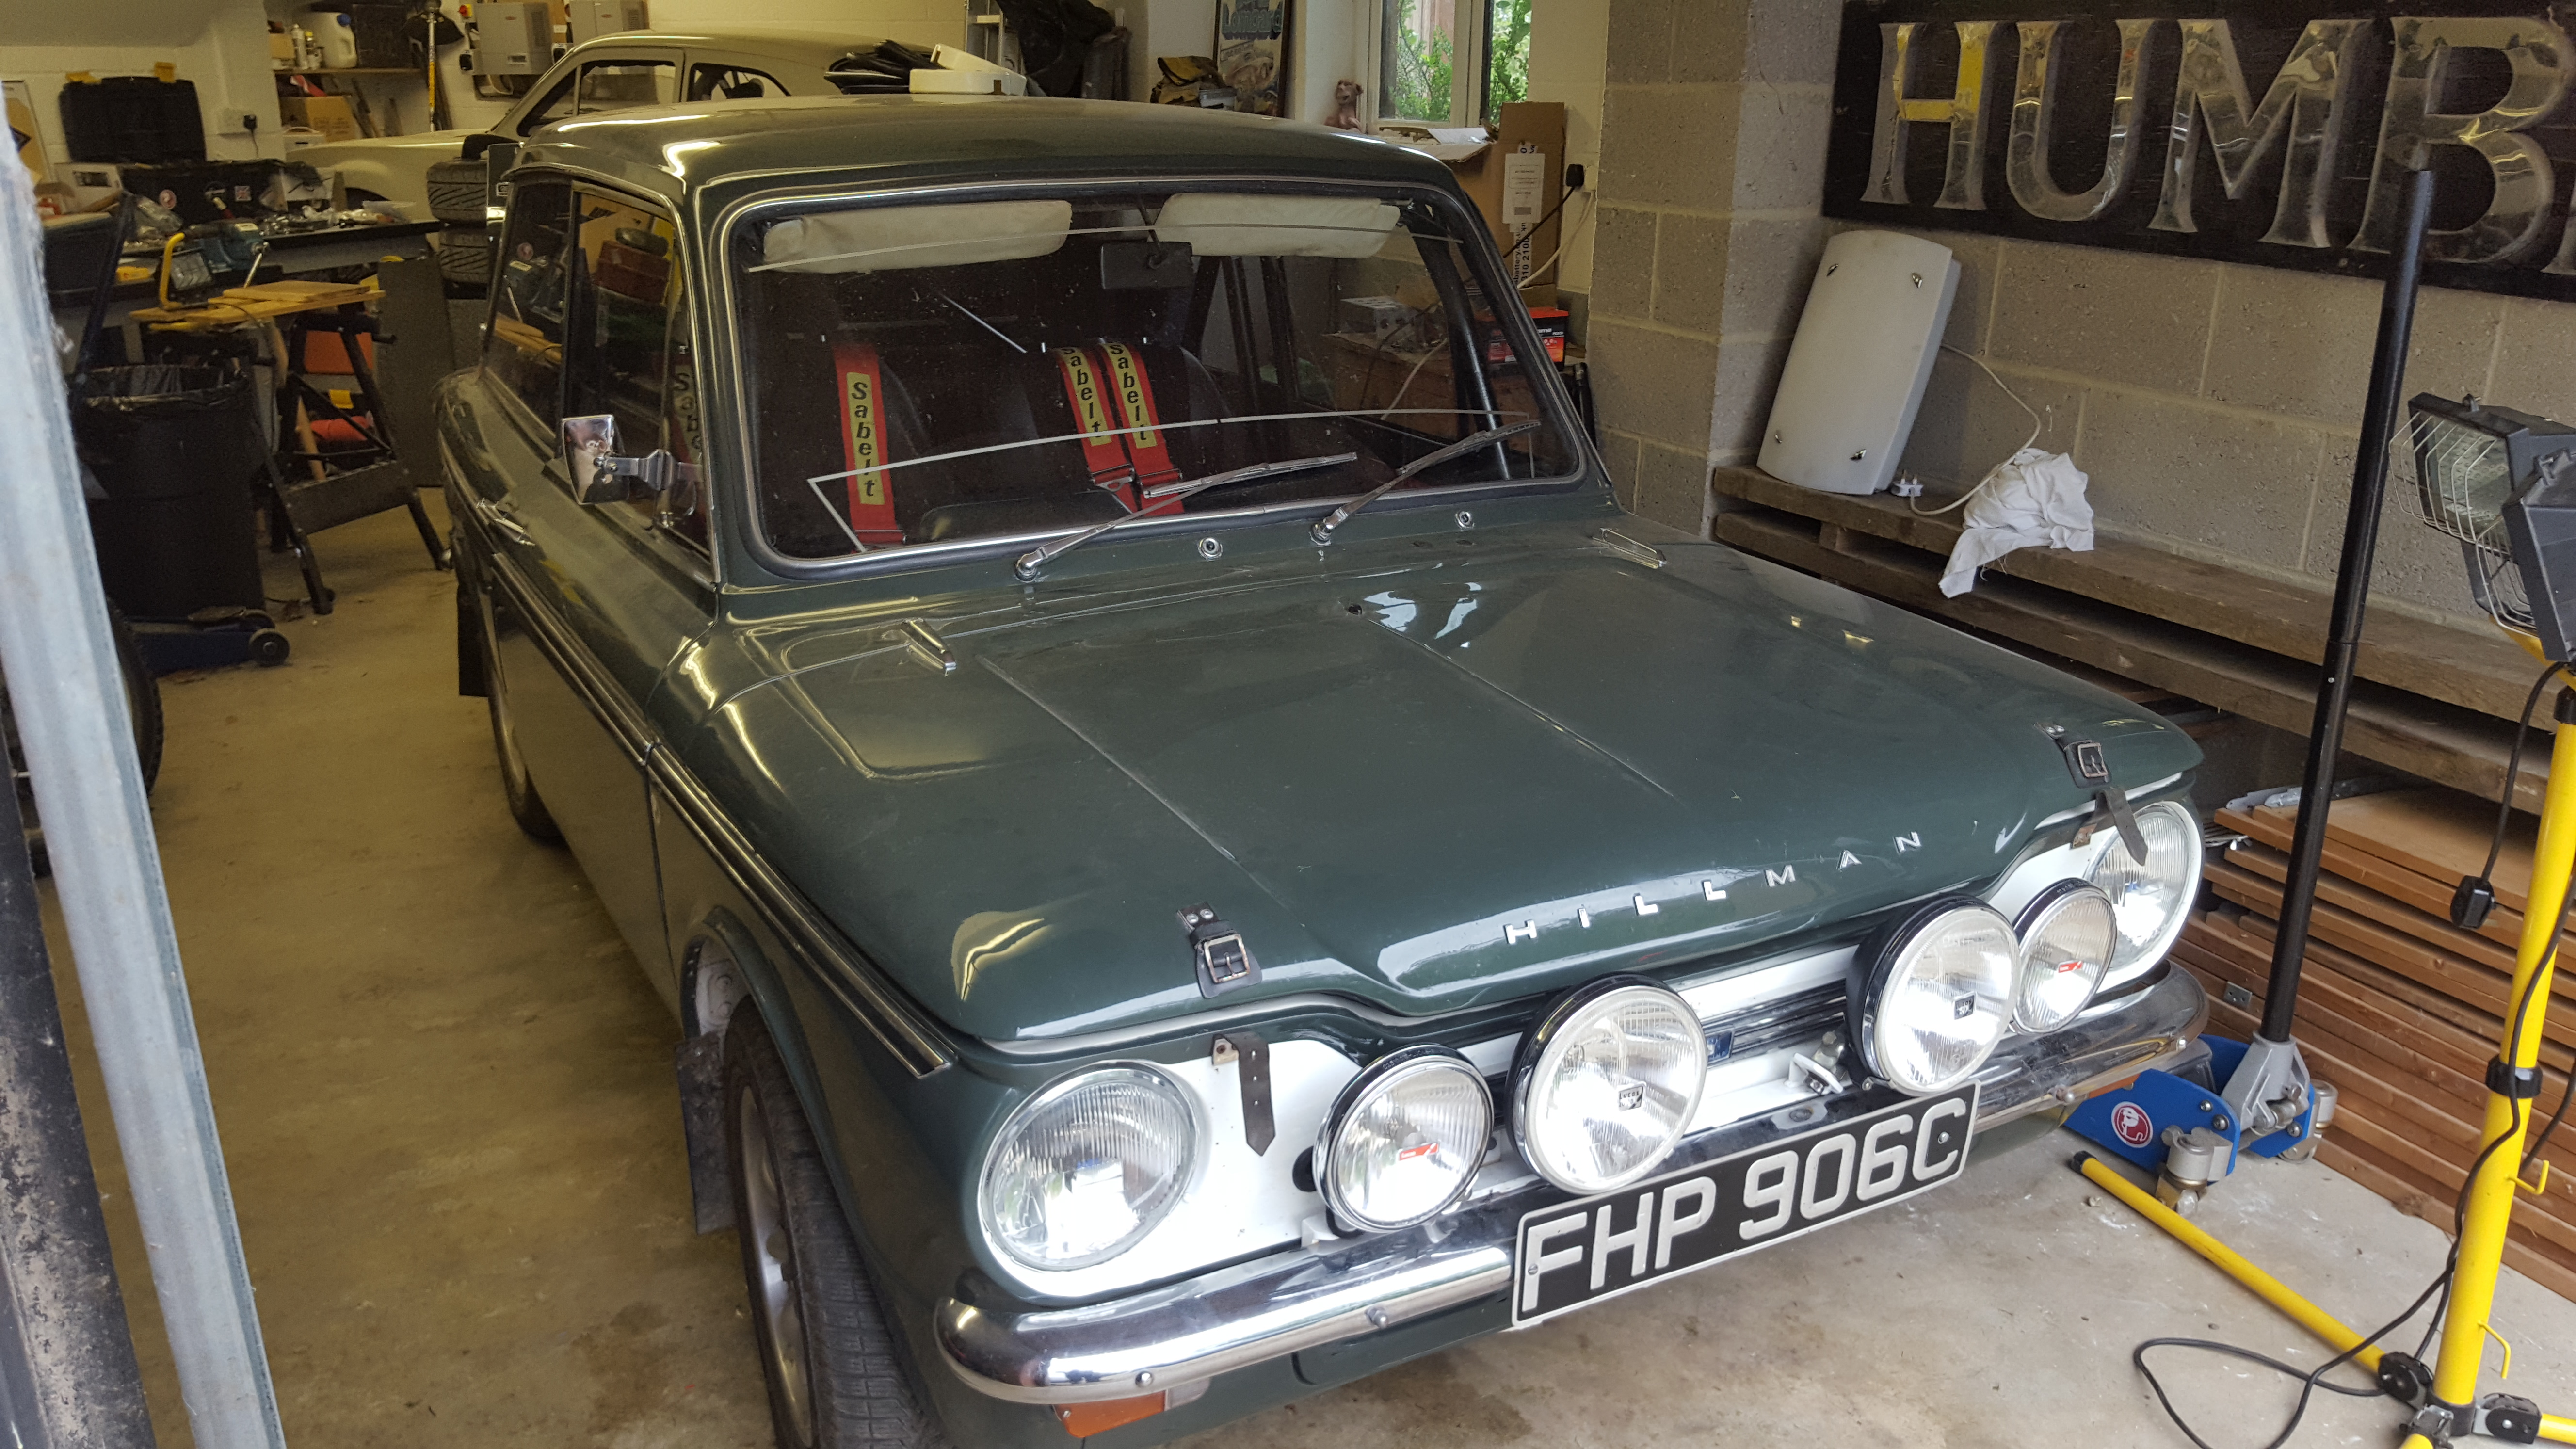 Vintagewireman-gallery-Hillman-imp-rally-car